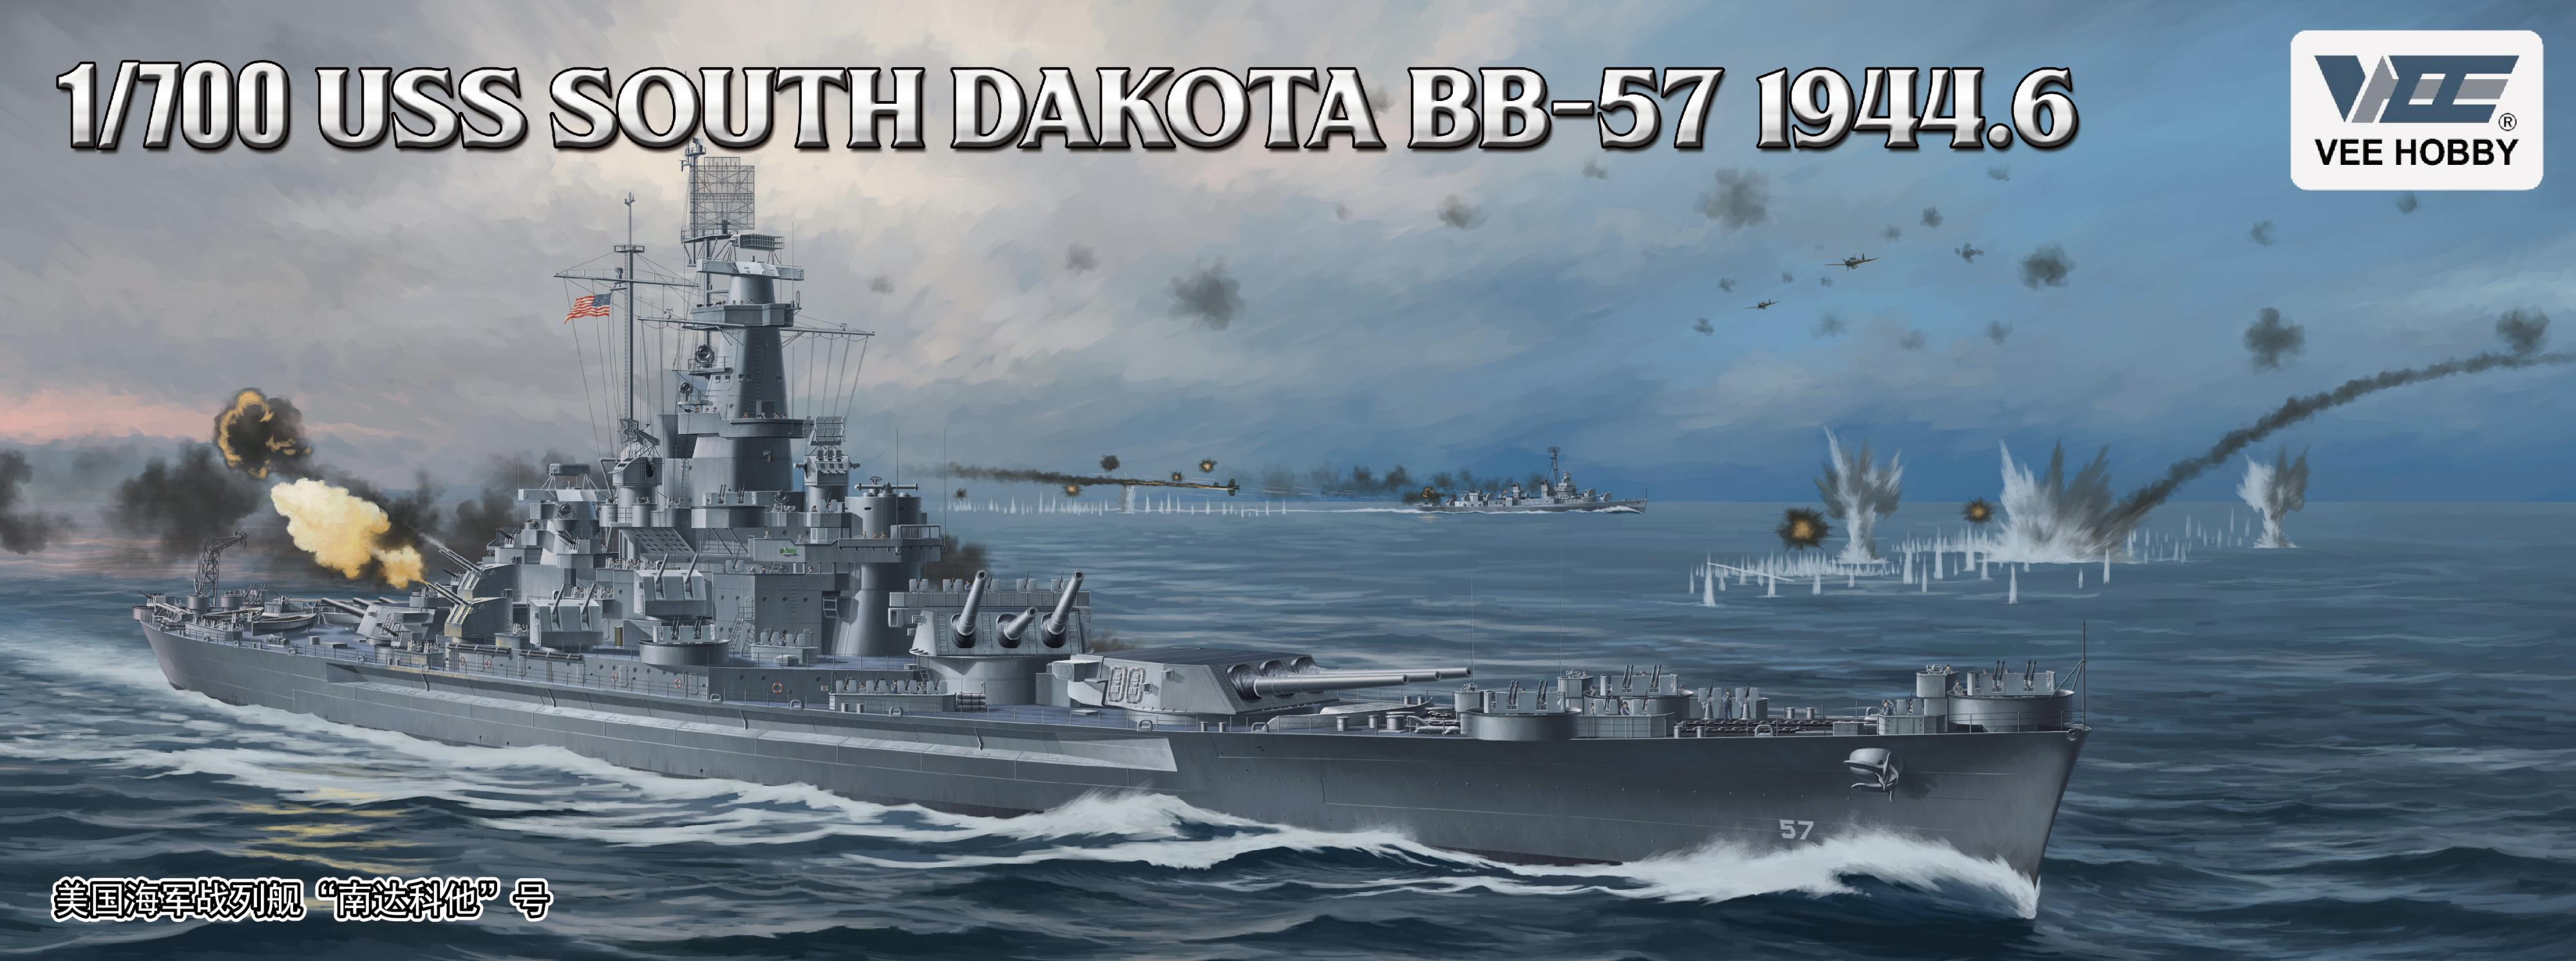 Vee Hobby 1/700 South Dakota Battleship BB-57 1944 (Standard Edition)